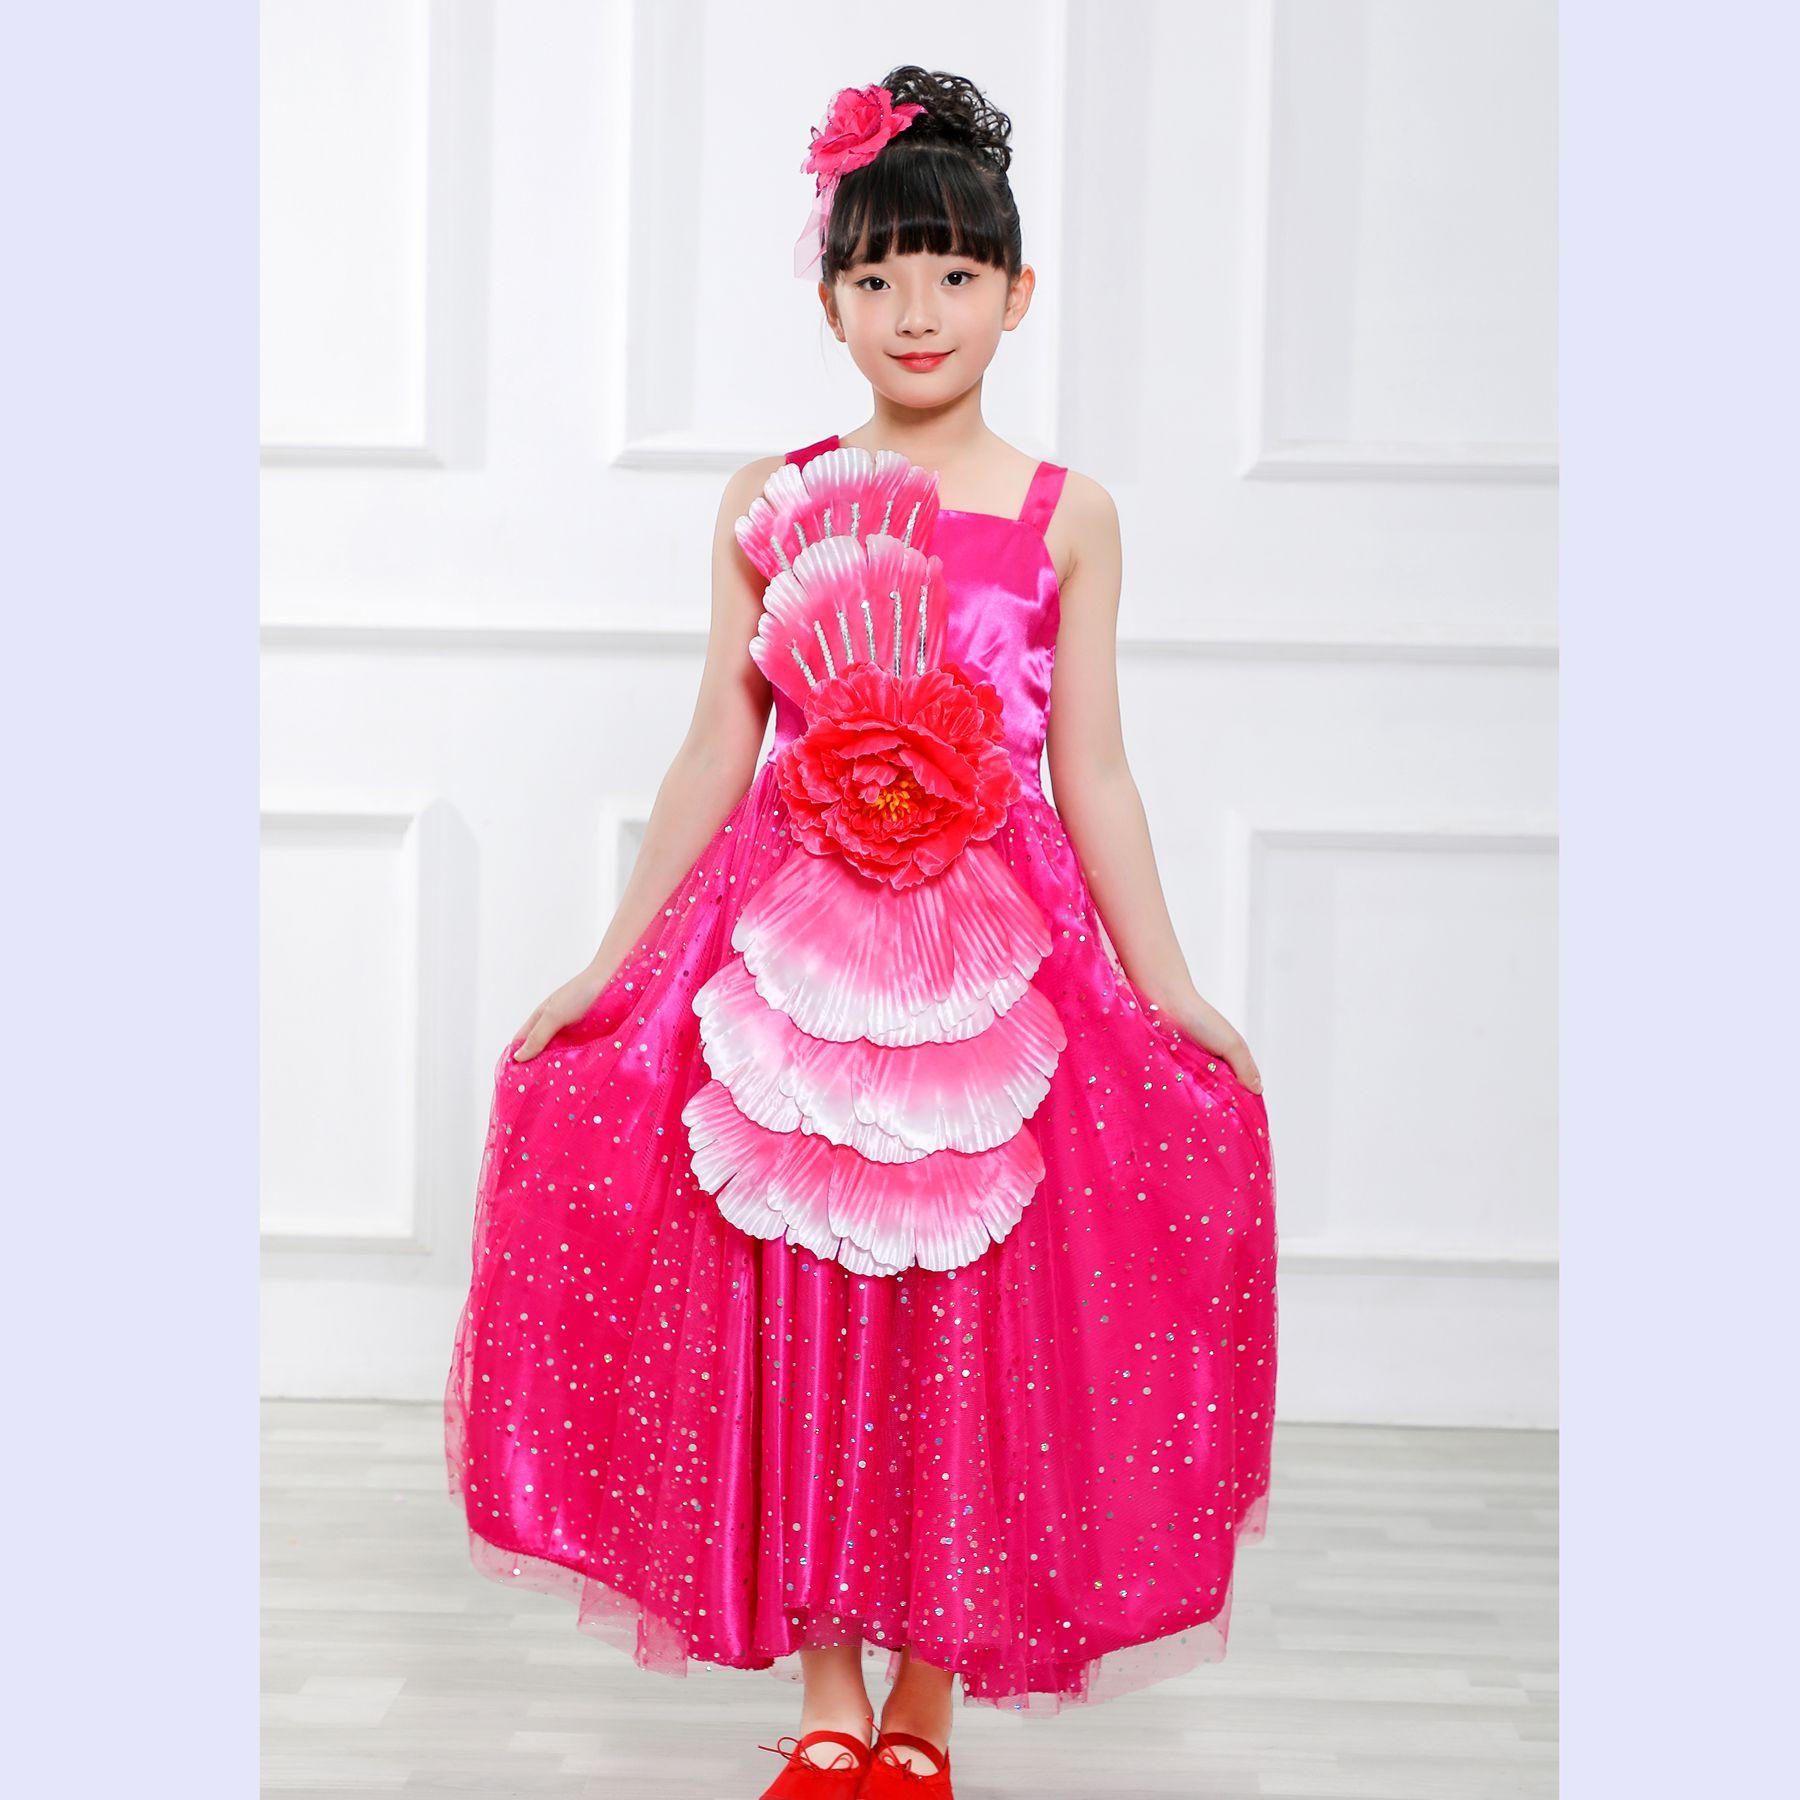 87e561f9a7d99 Iiniim Unisex niños niñas hip-hop Jazz de la clase de baile ropa brillante  lentejuelas